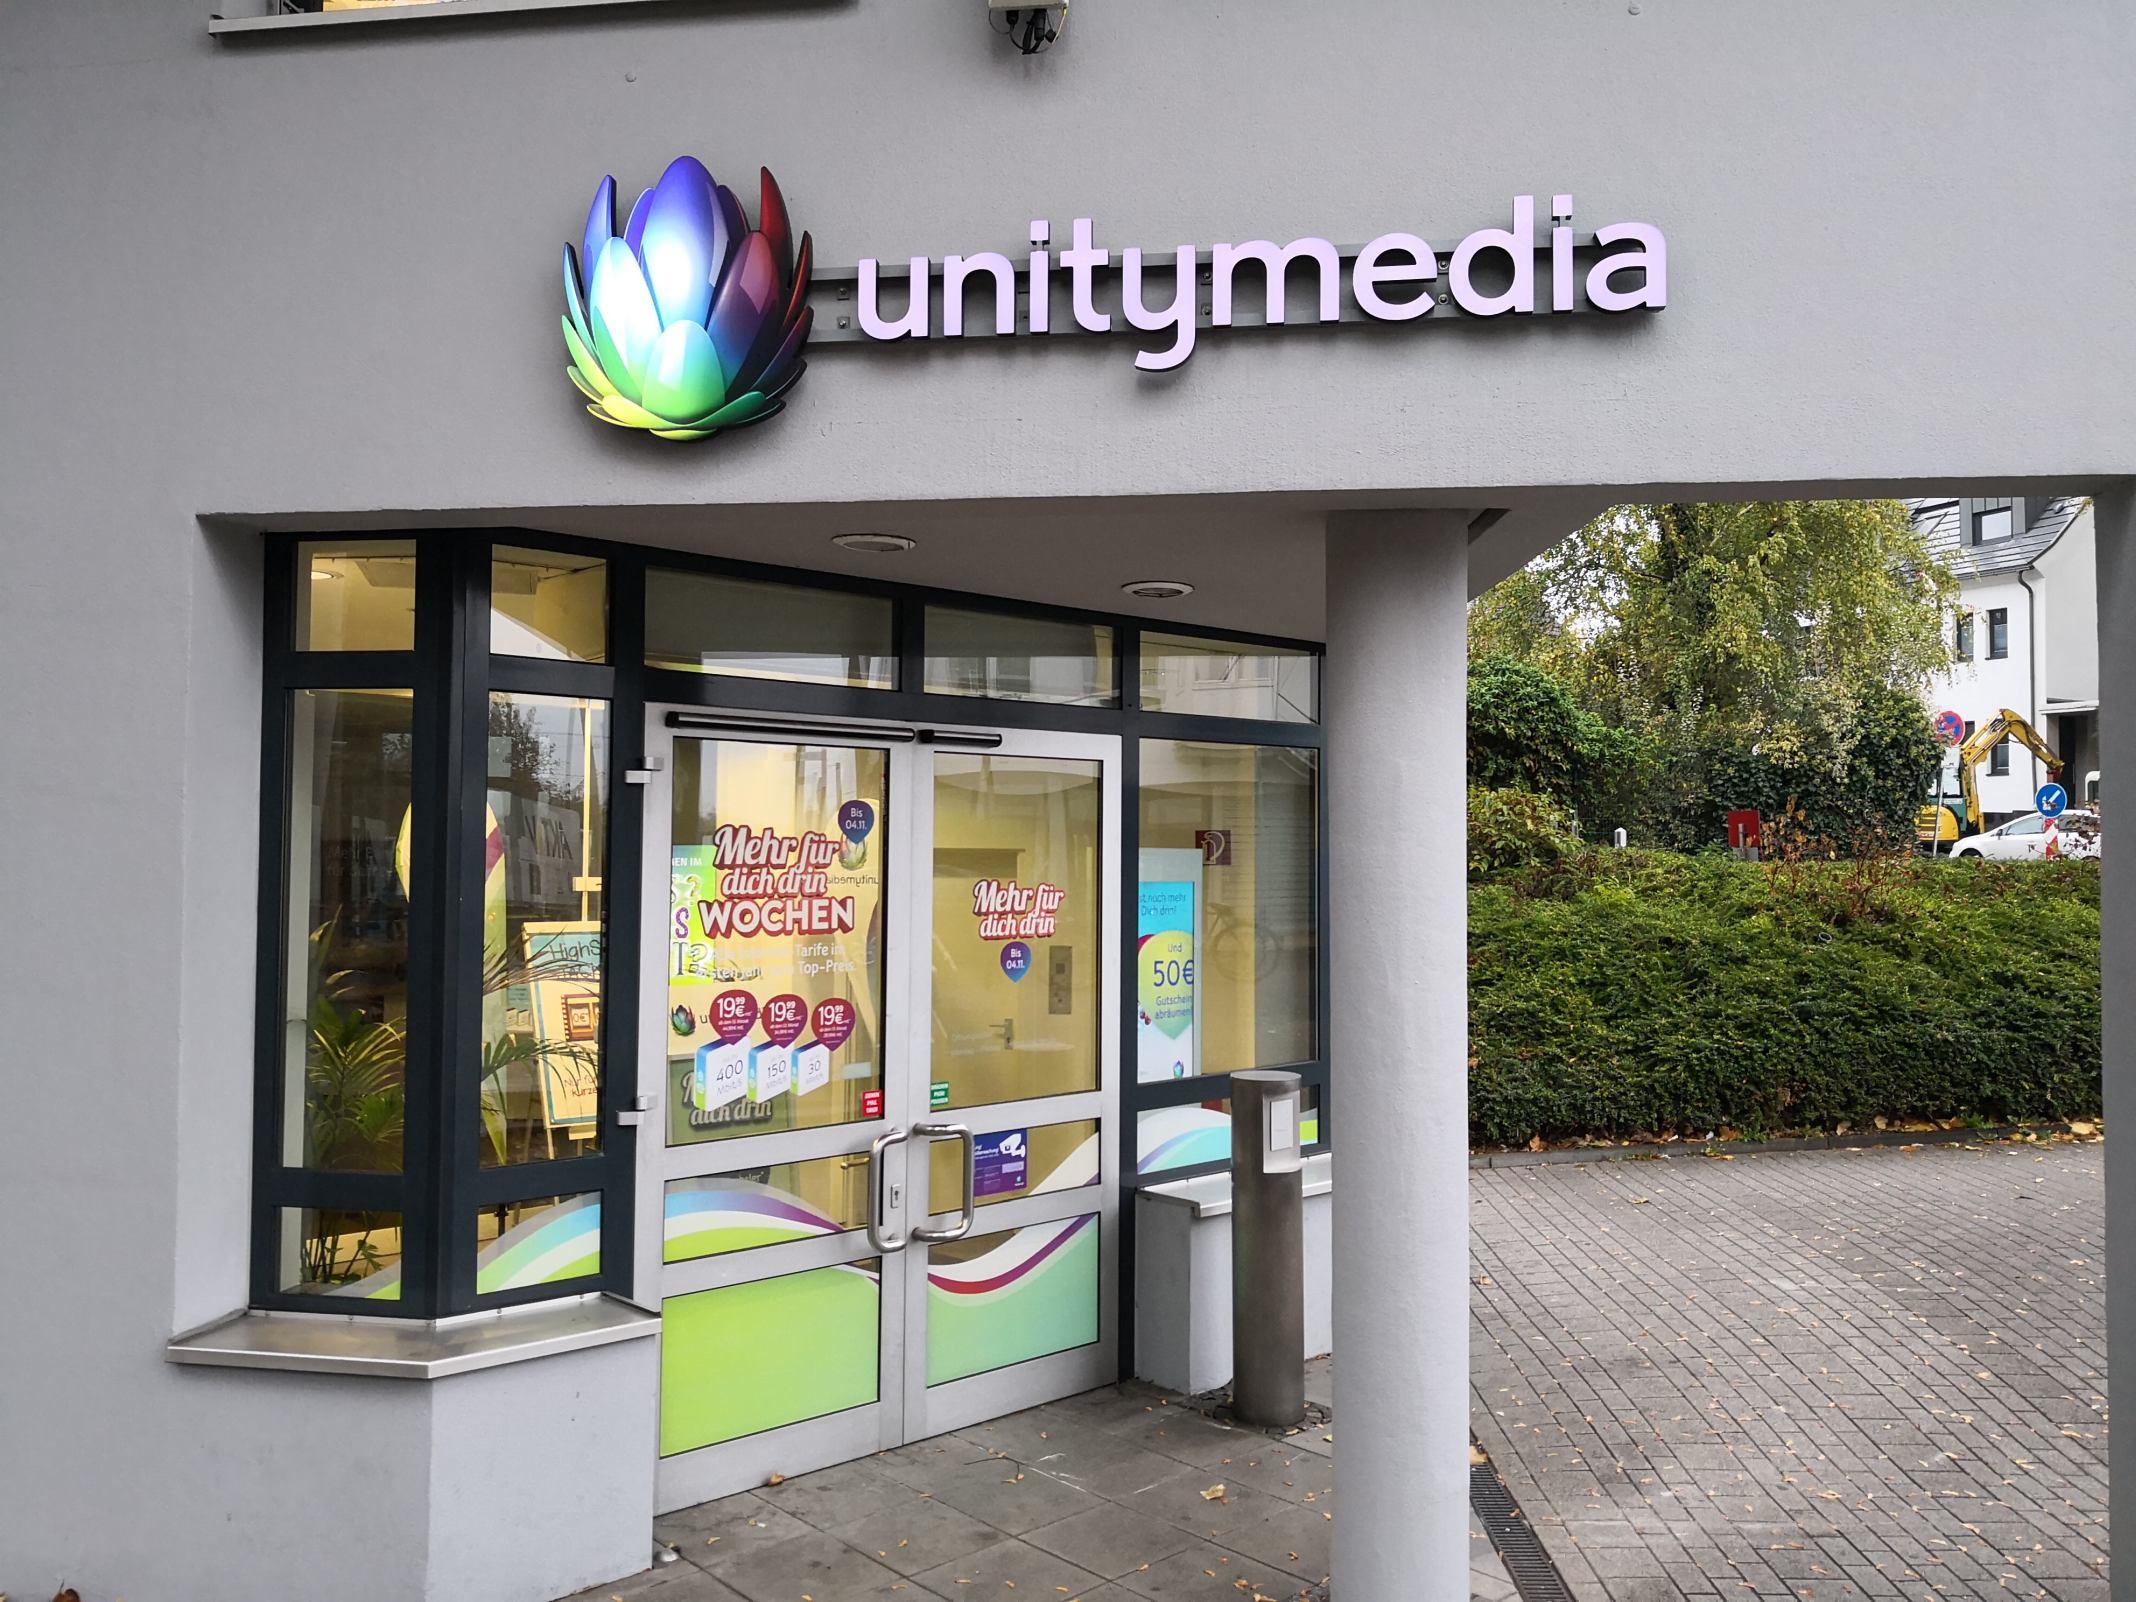 Der Eingangsbereich eines Unitymedia-Shops mit einem Unitymedia-Logo